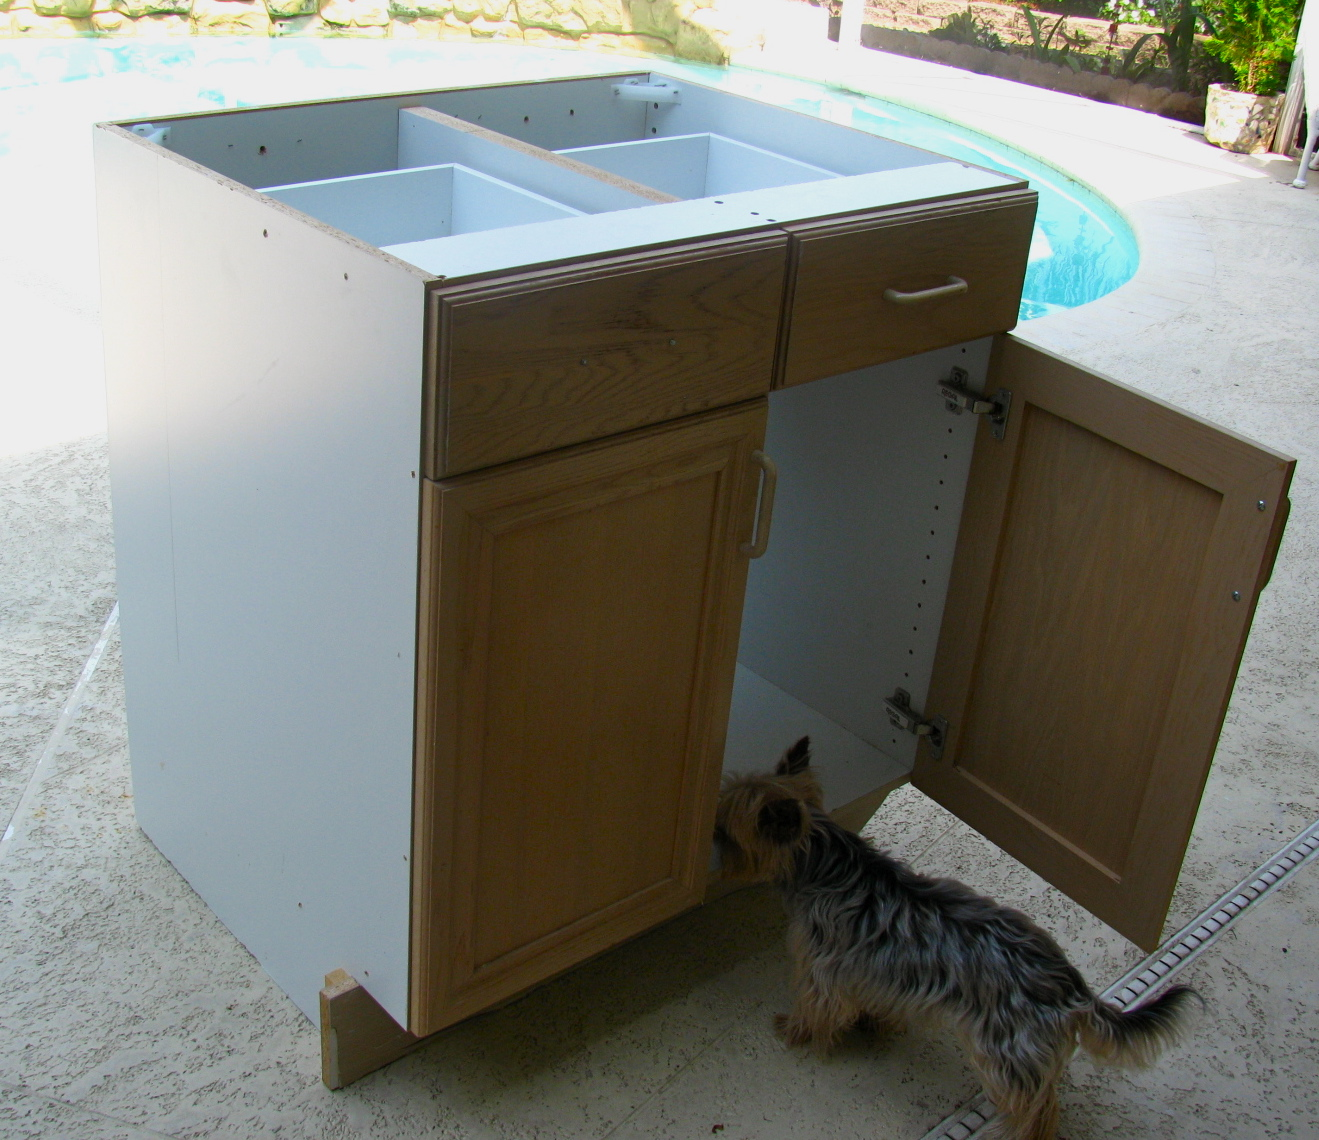 Kitchen Cabinet Salvage: MAY DAYS: Salvage A Kitchen Cabinet